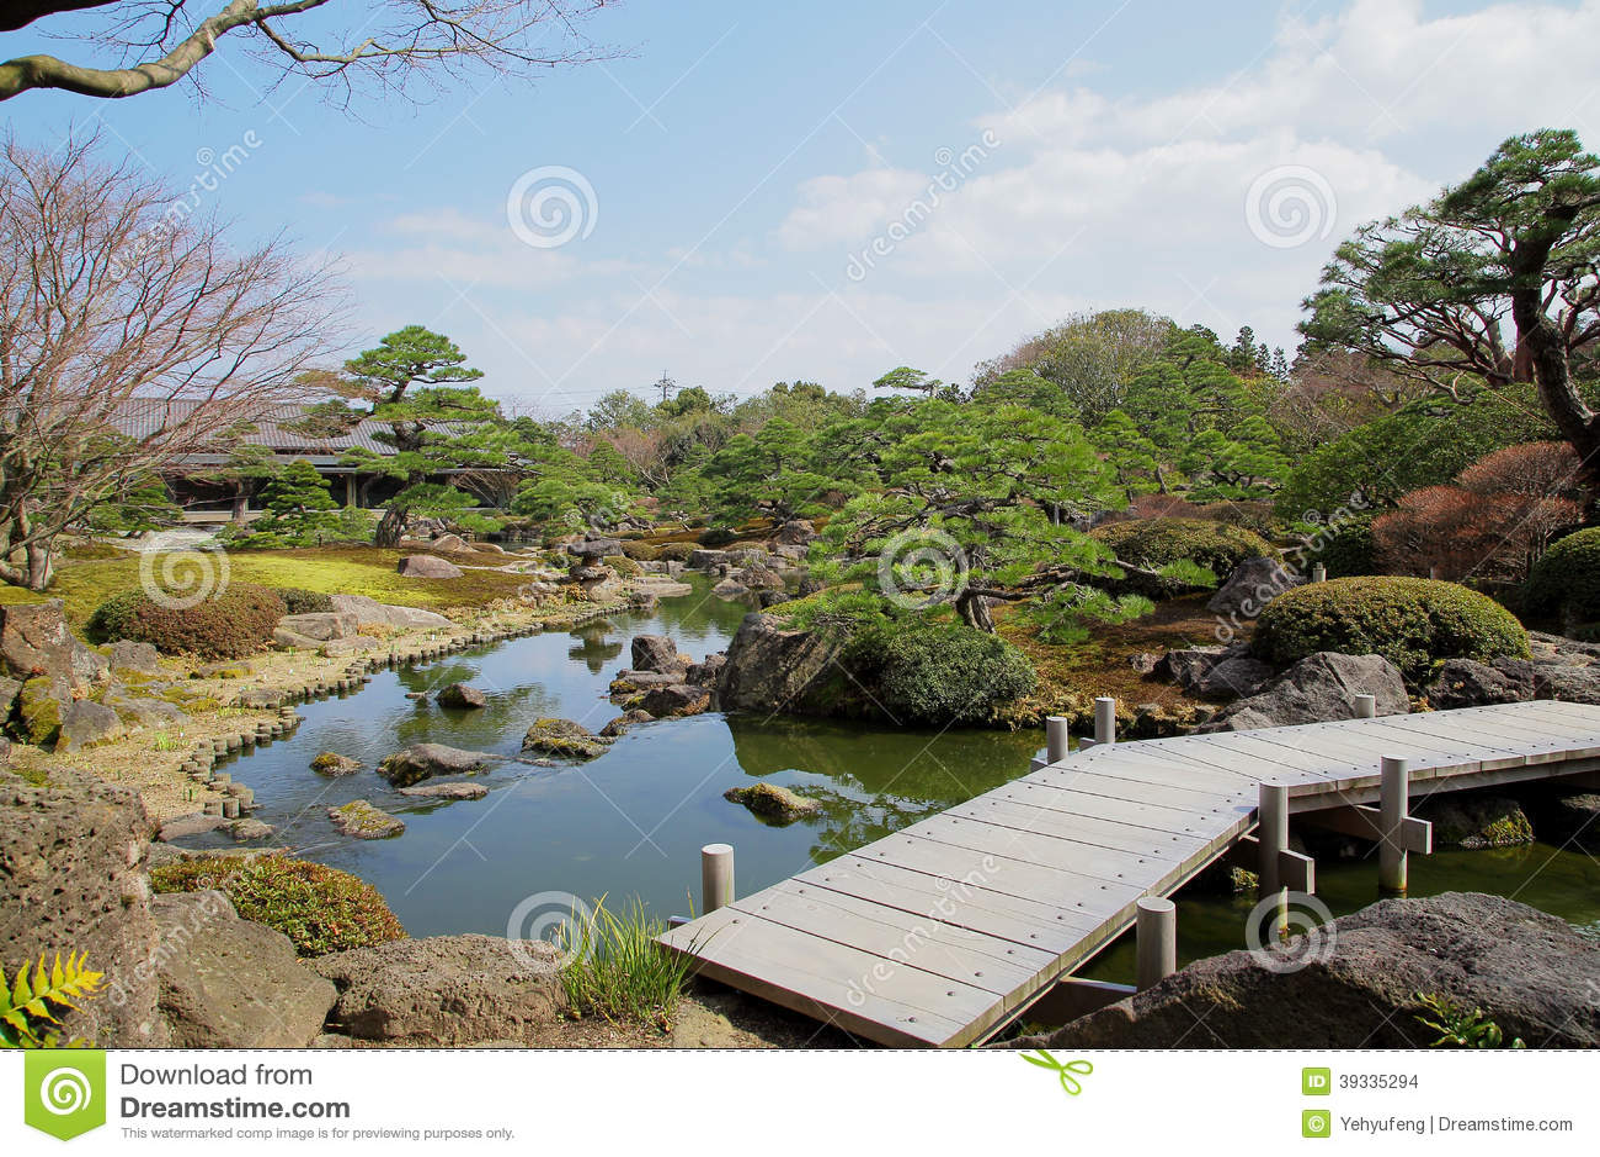 Bridge over pond of japanese garden stock photo image for Garden pond design software free download